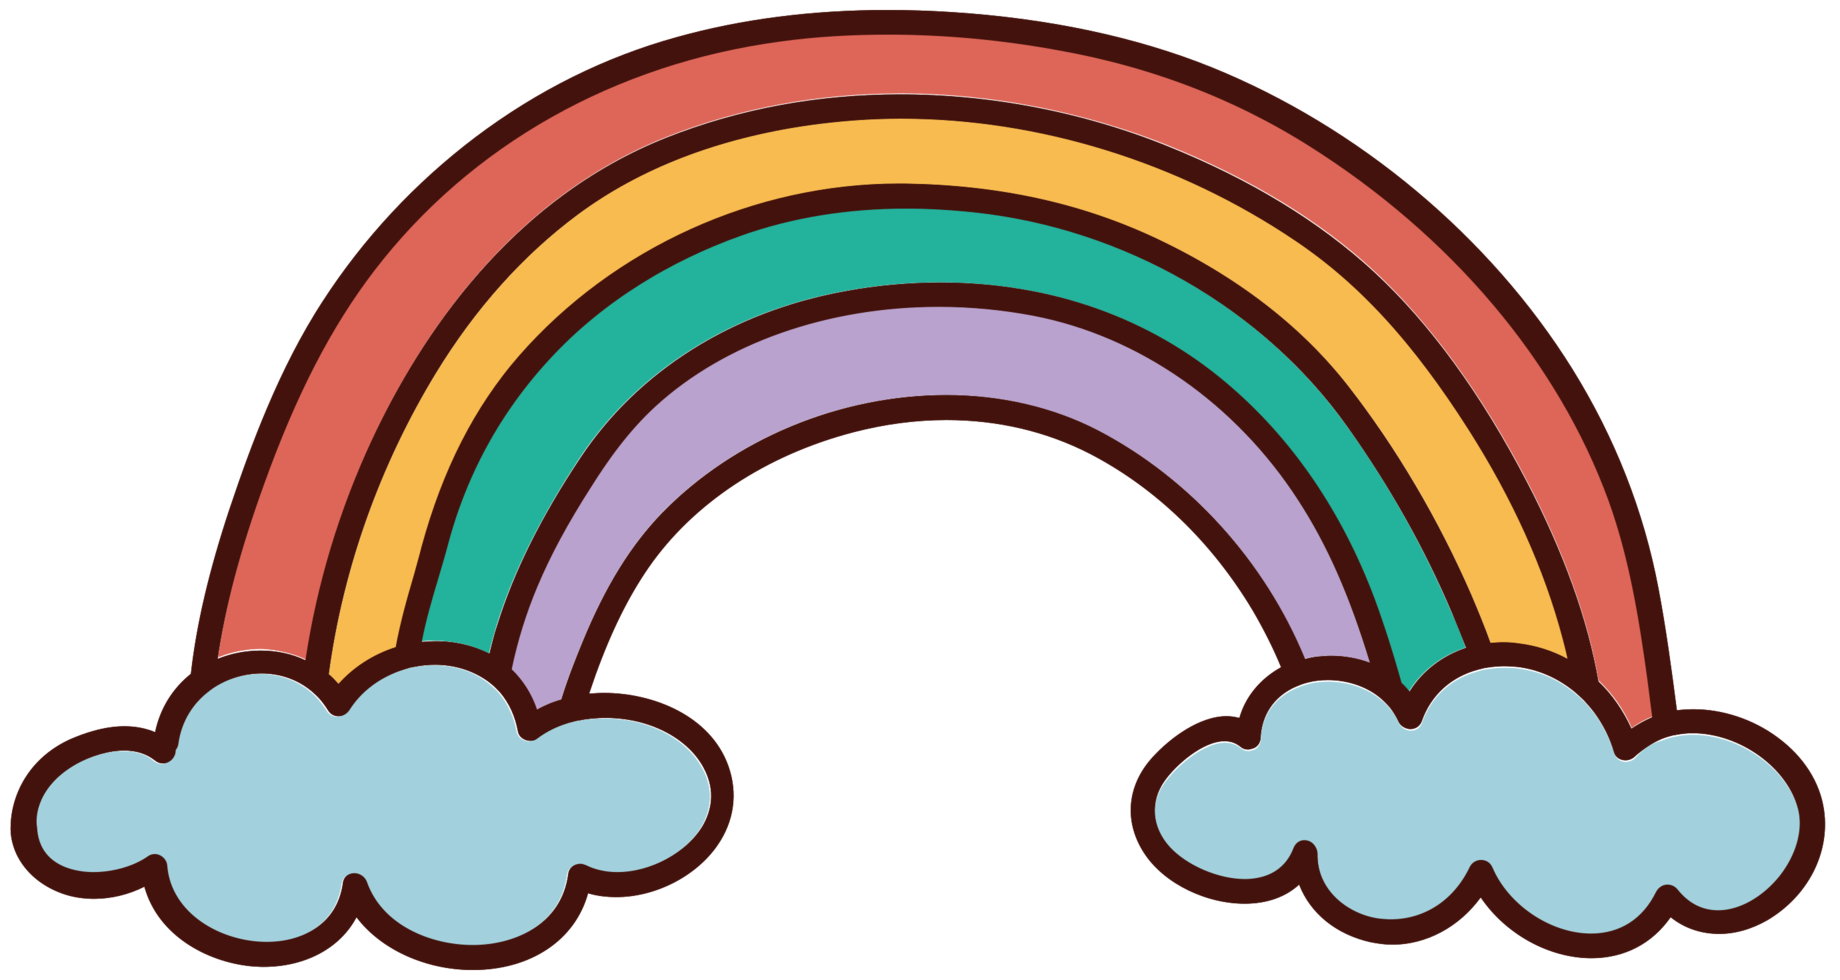 arco Iris png